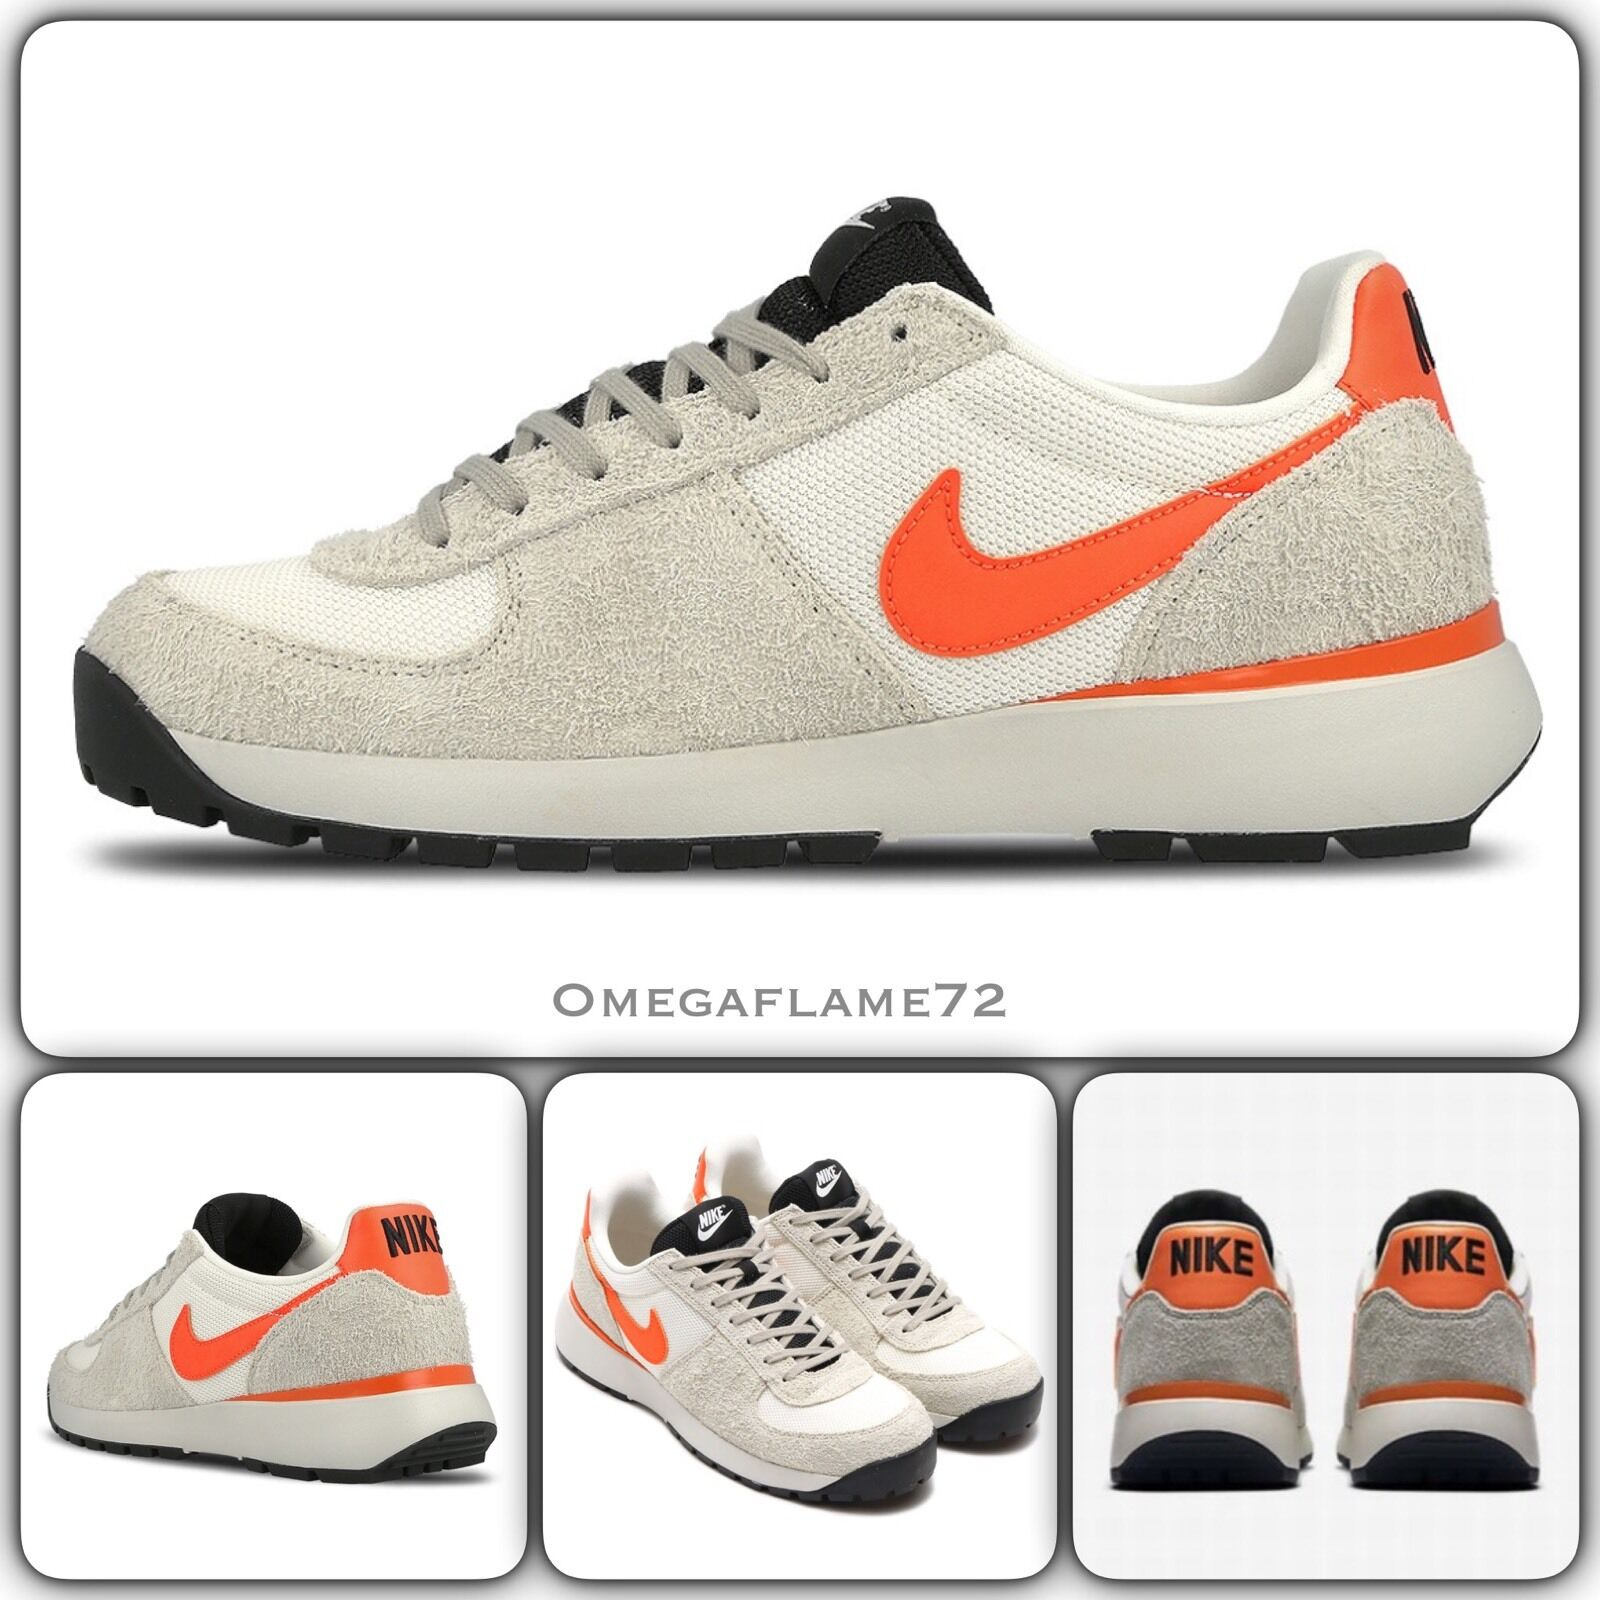 Nike Lava Dome Ultra 844574-001 844574-001 844574-001 Sz7 EUR 41 USA 8  Wildwood Mowabb ACG 7a07ed